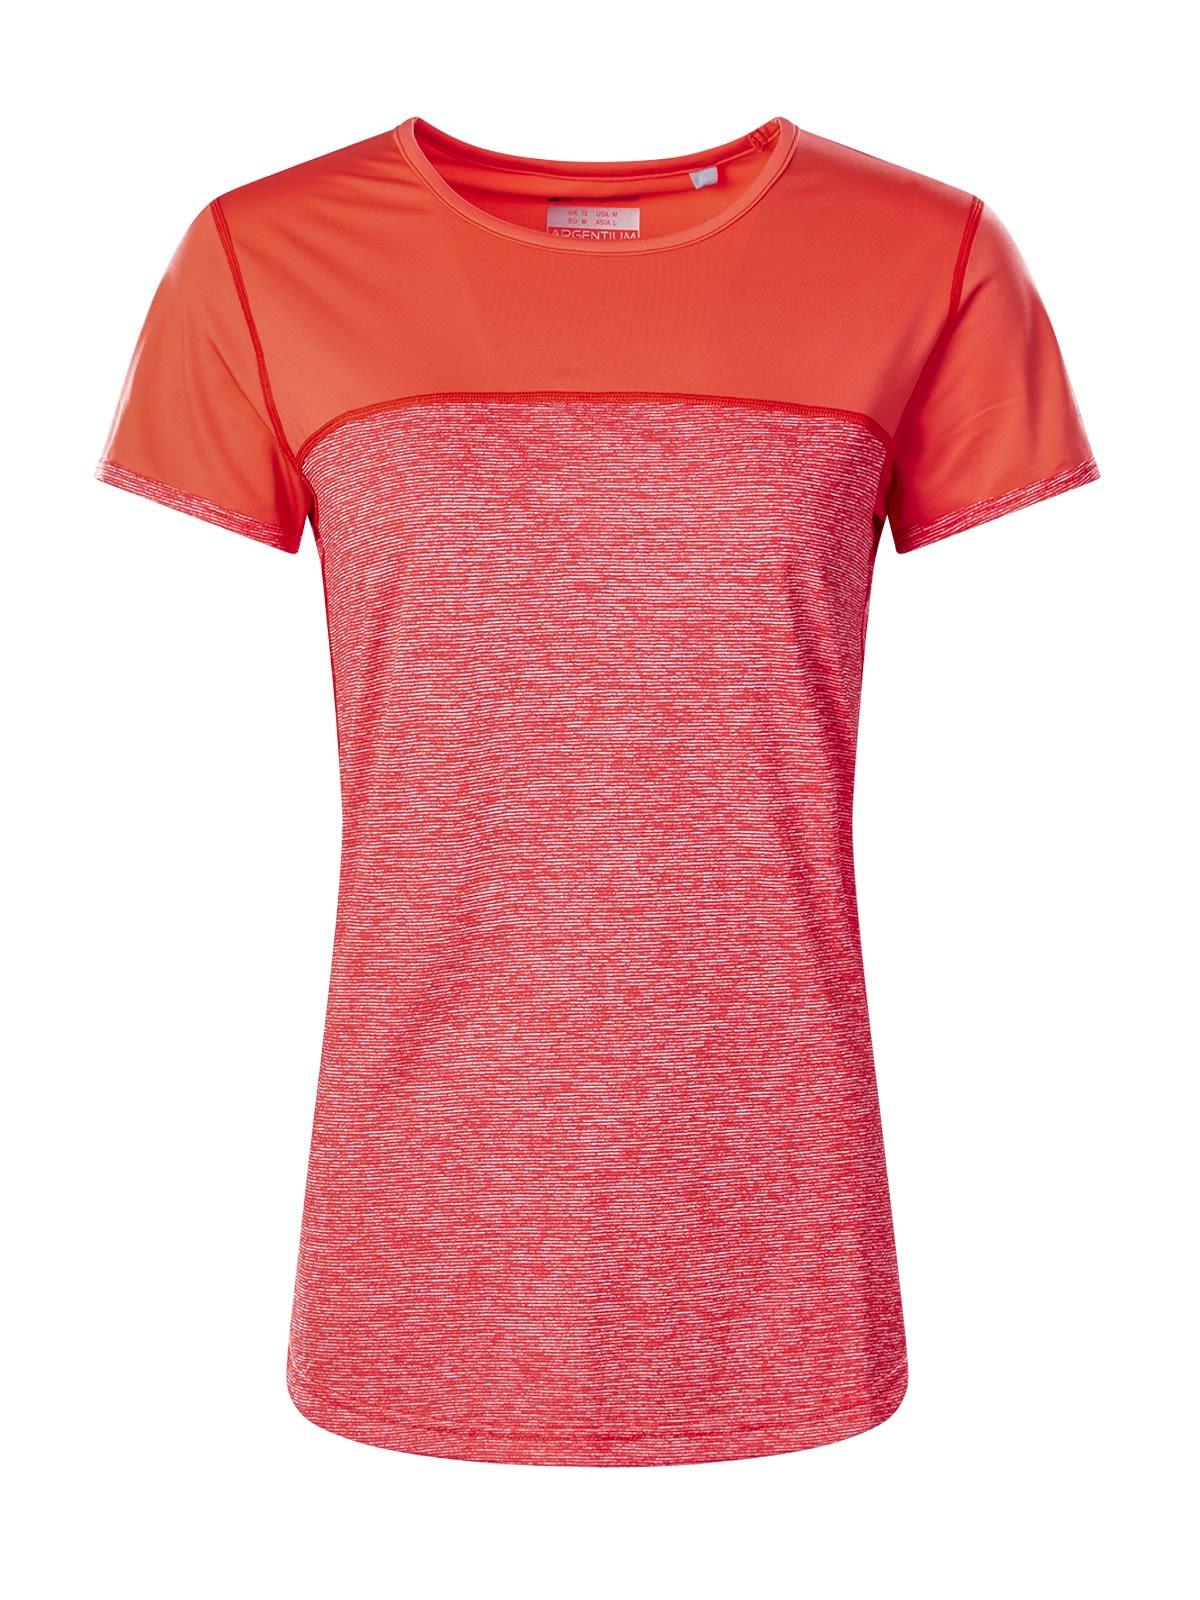 Berghaus Voyager Tech Tee Pink, Female Kurzarm-Shirt, S -10